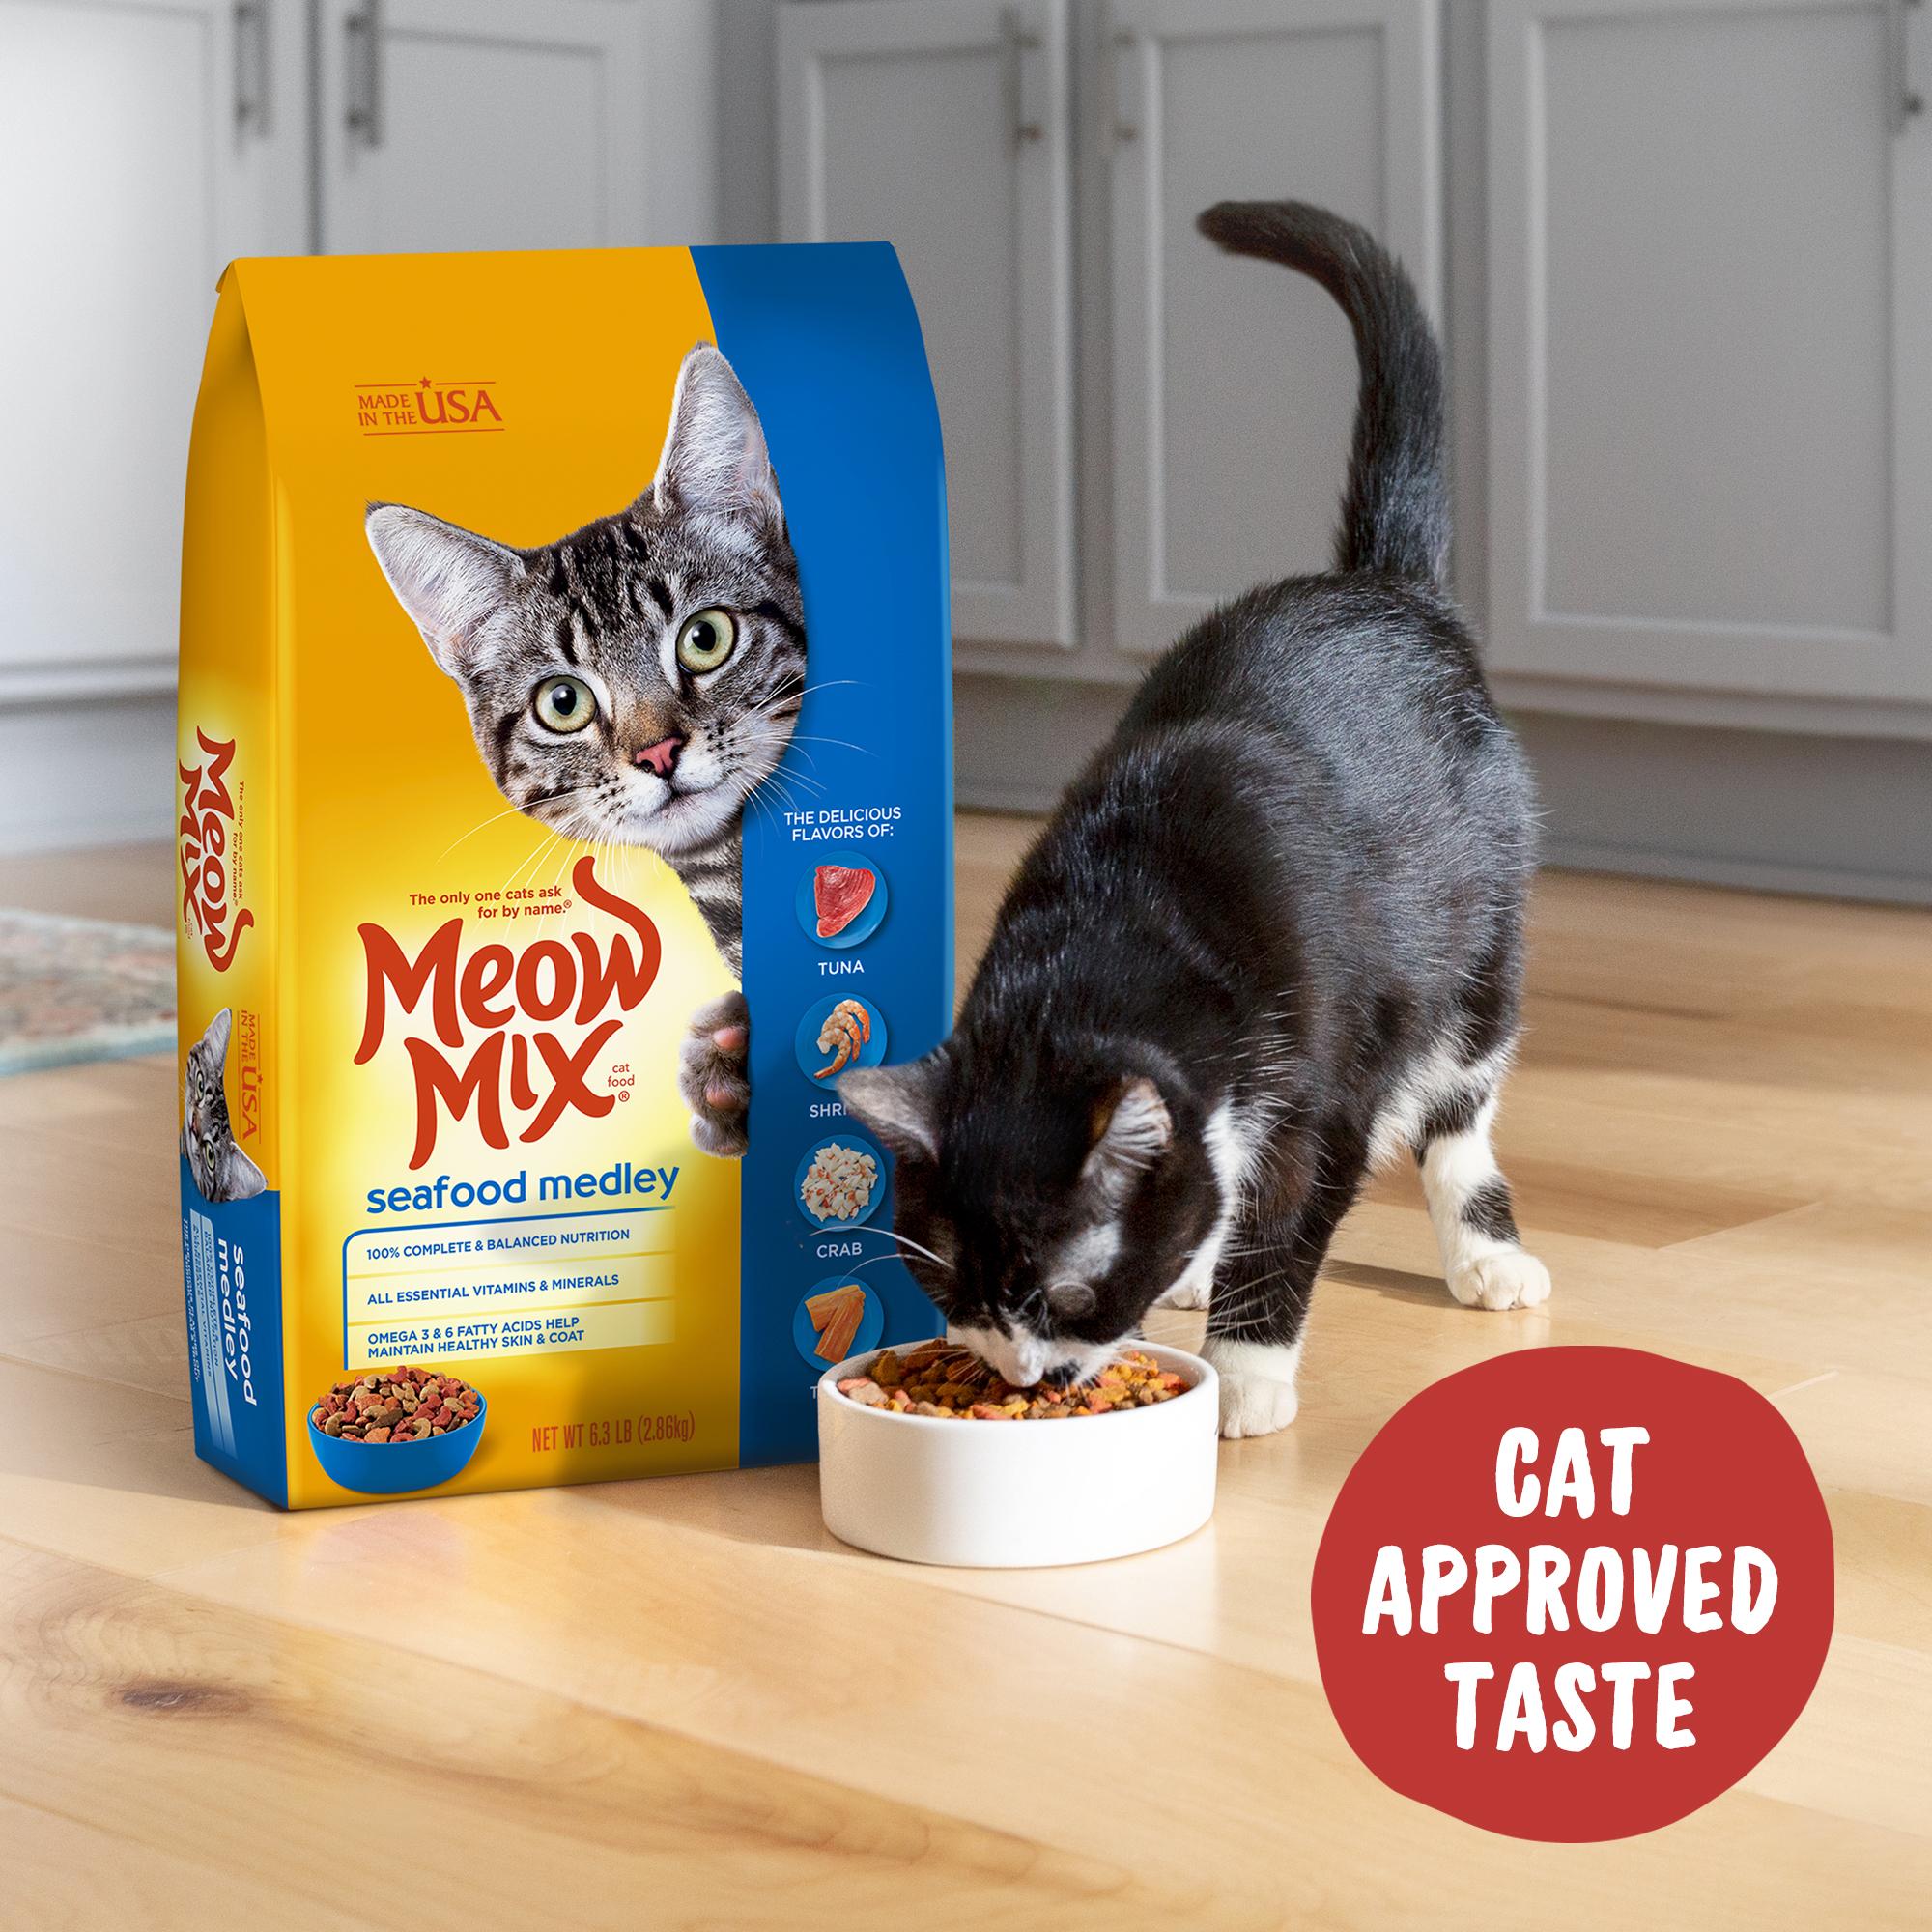 Meow Mix Seafood Medley Dry Cat Food $9.37 (reg $16)